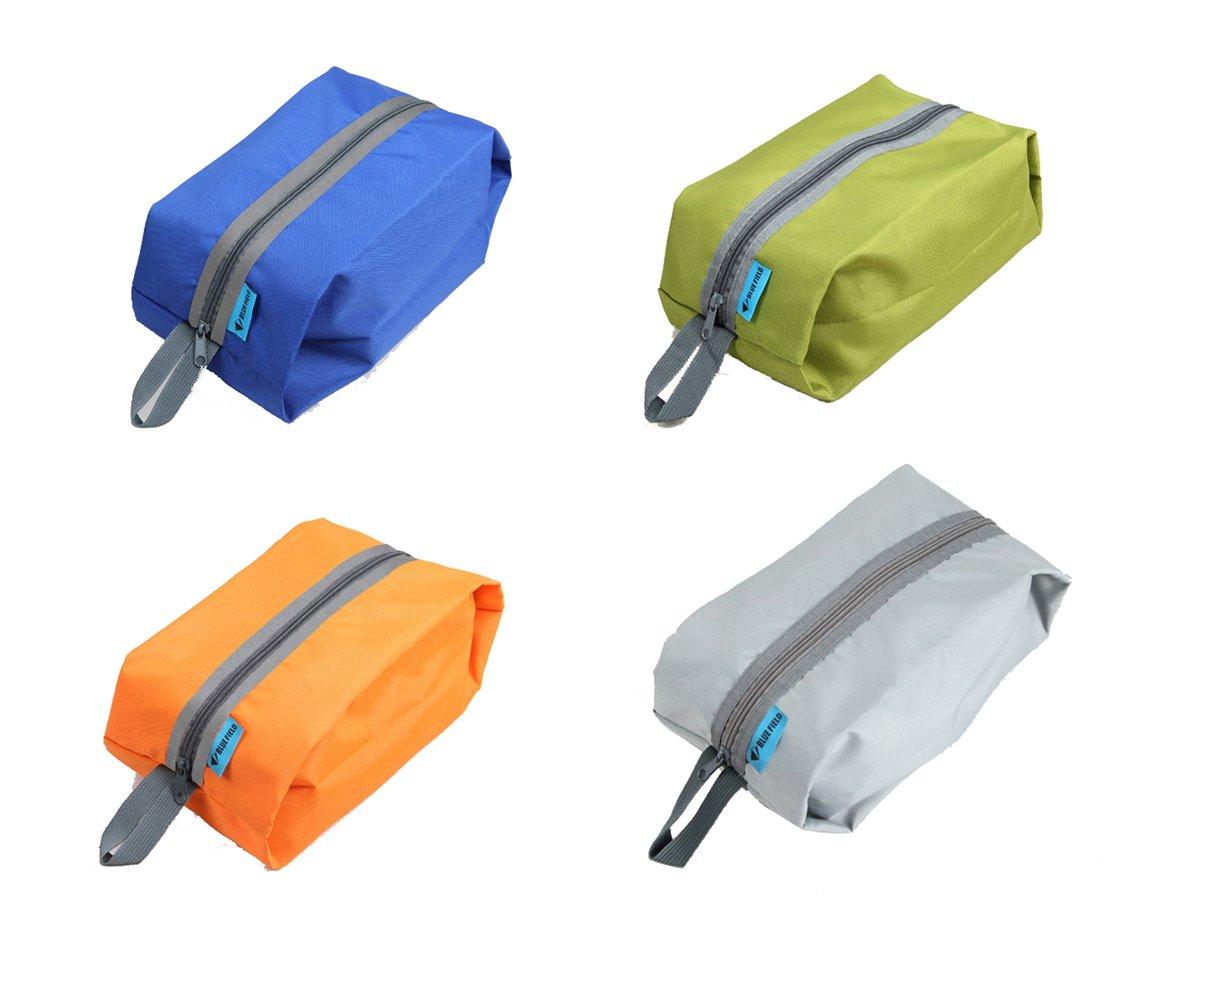 Tumecos Large Waterproof Portable Travel Organizer Toiletry Shoe Bag Pouch 4 pcs